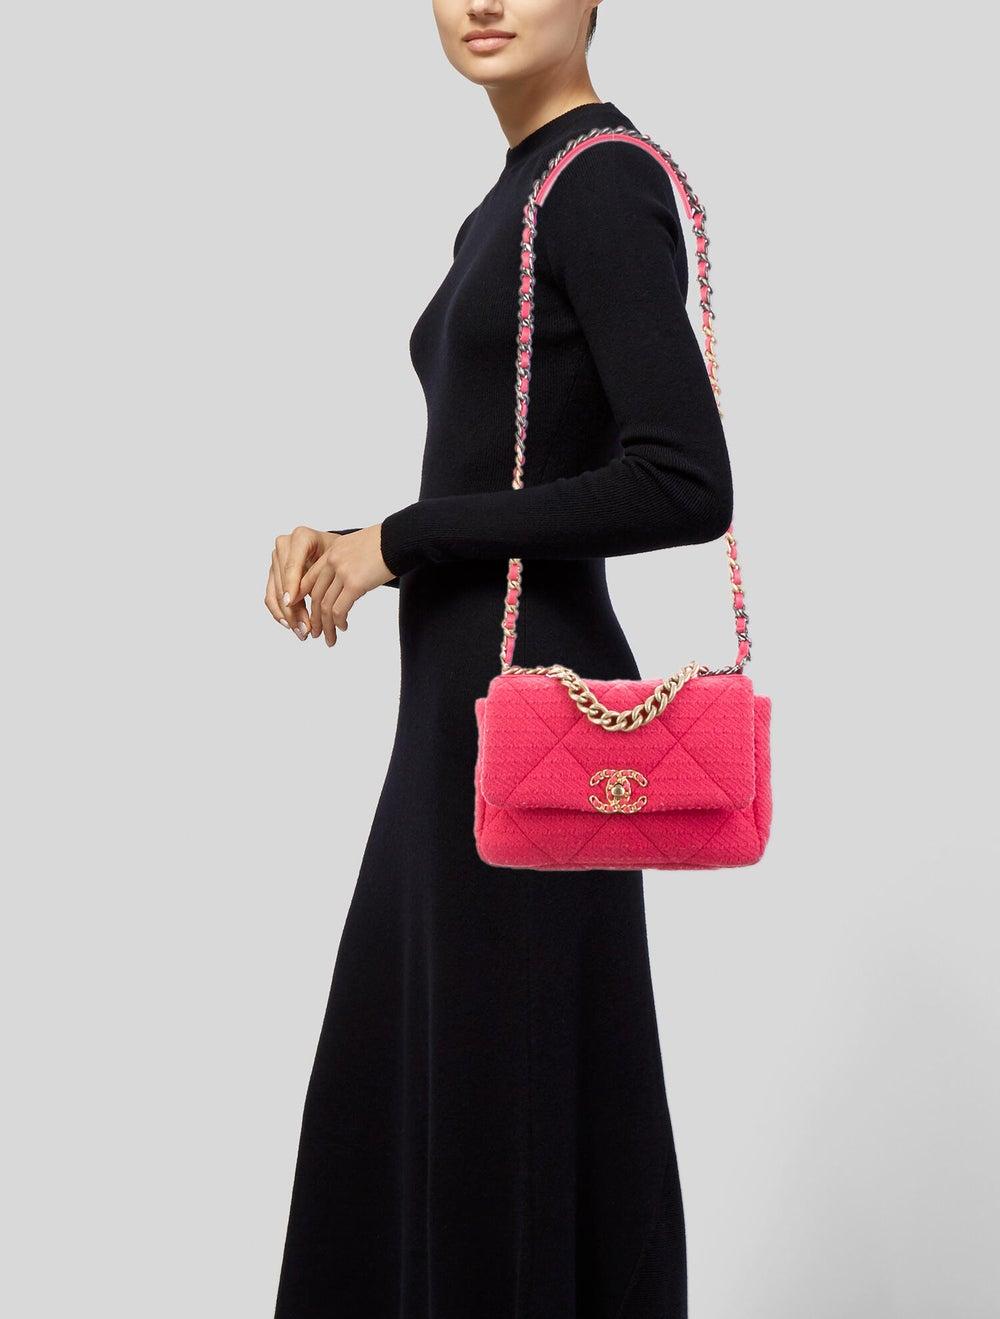 Chanel 2020 Medium Tweed 19 Bag Pink - image 2